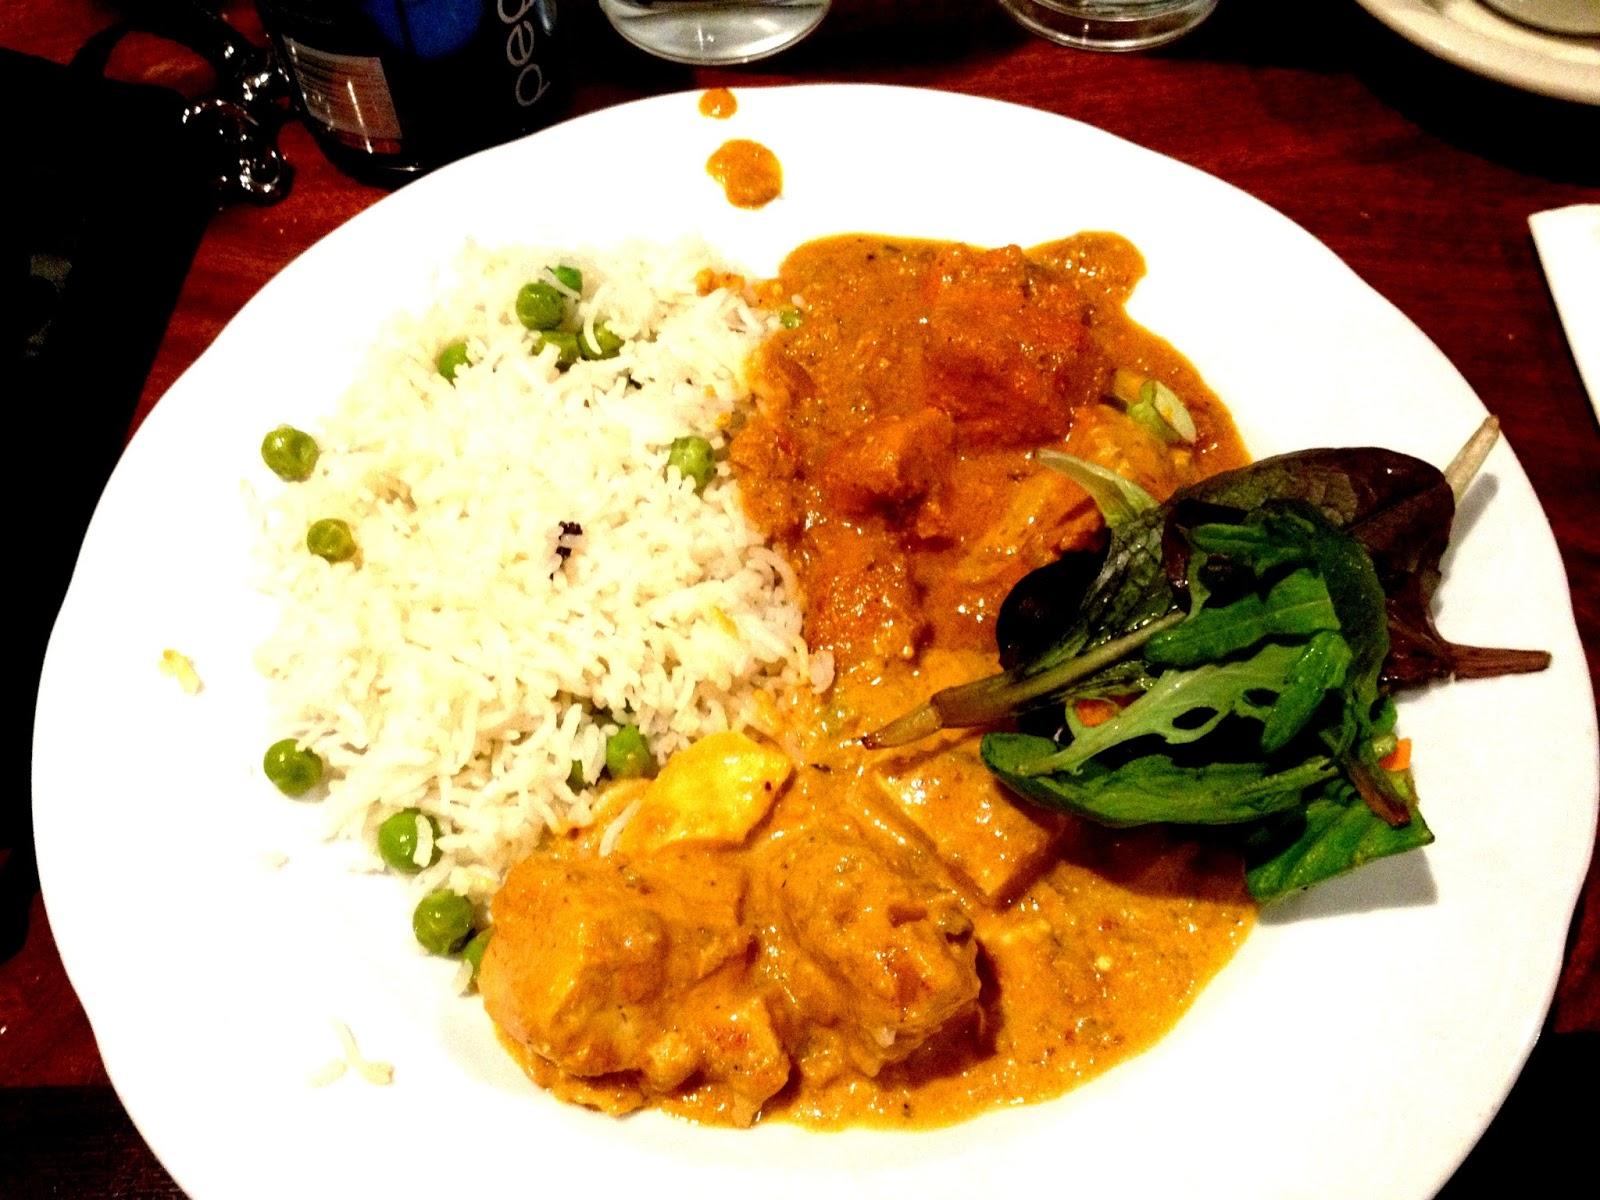 My first plate - Chicken Tikka Masala, Tofu Veggie Curry, and Basmati Rice